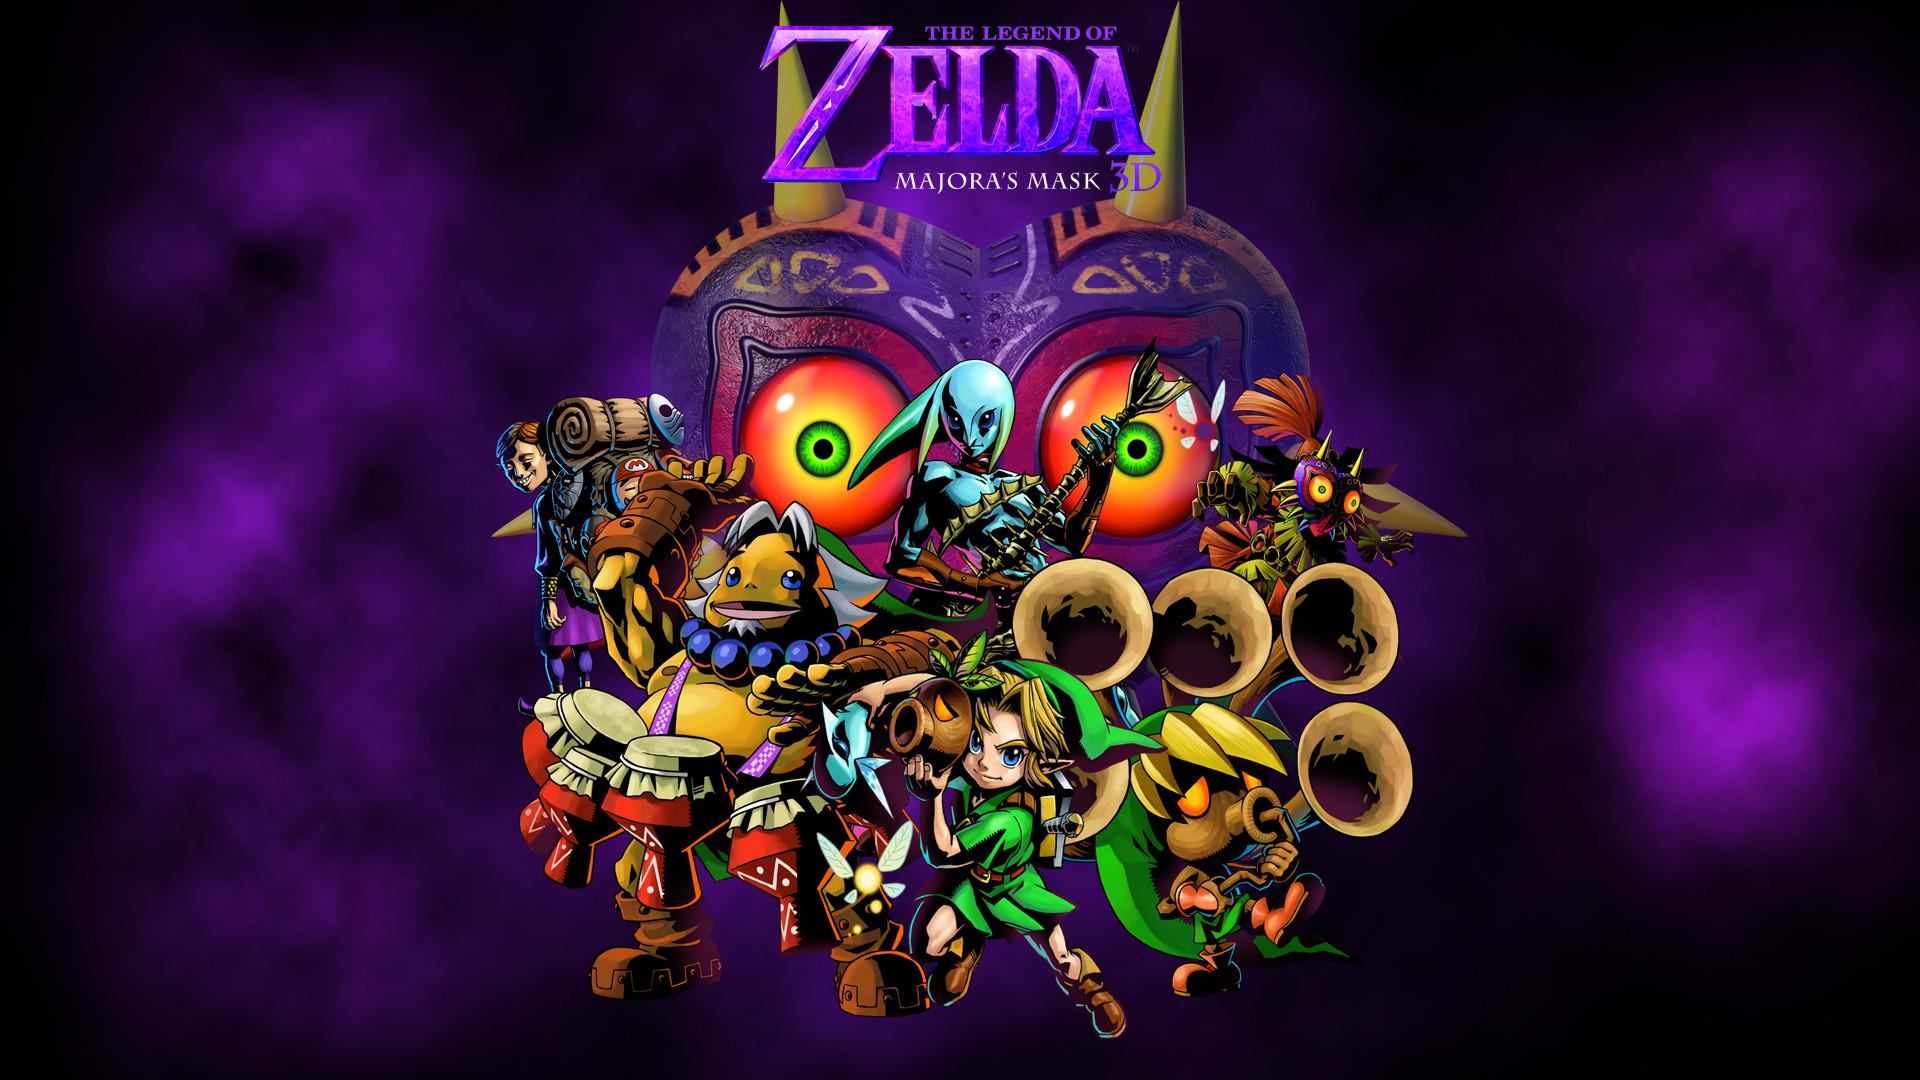 Zelda Majora S Mask 3ds Wallpaper By Zupertompa   Data-src - Zelda Majoras Mask Wallpaper Hd - HD Wallpaper